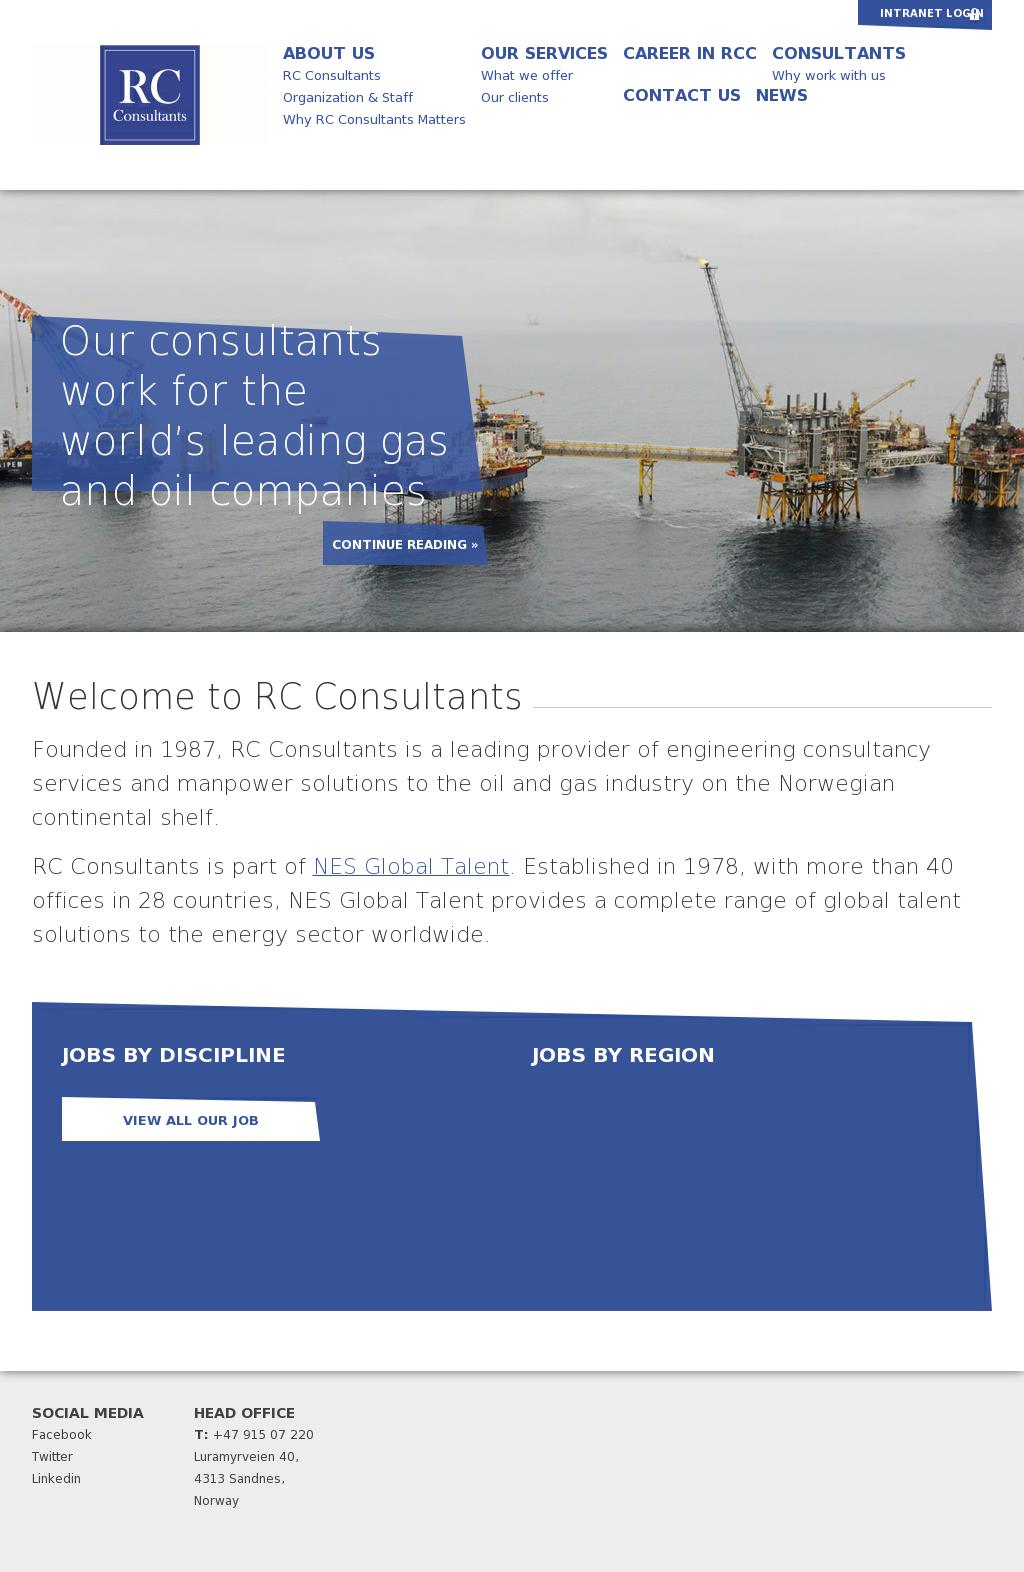 Offshore Drilling Consultant Companies